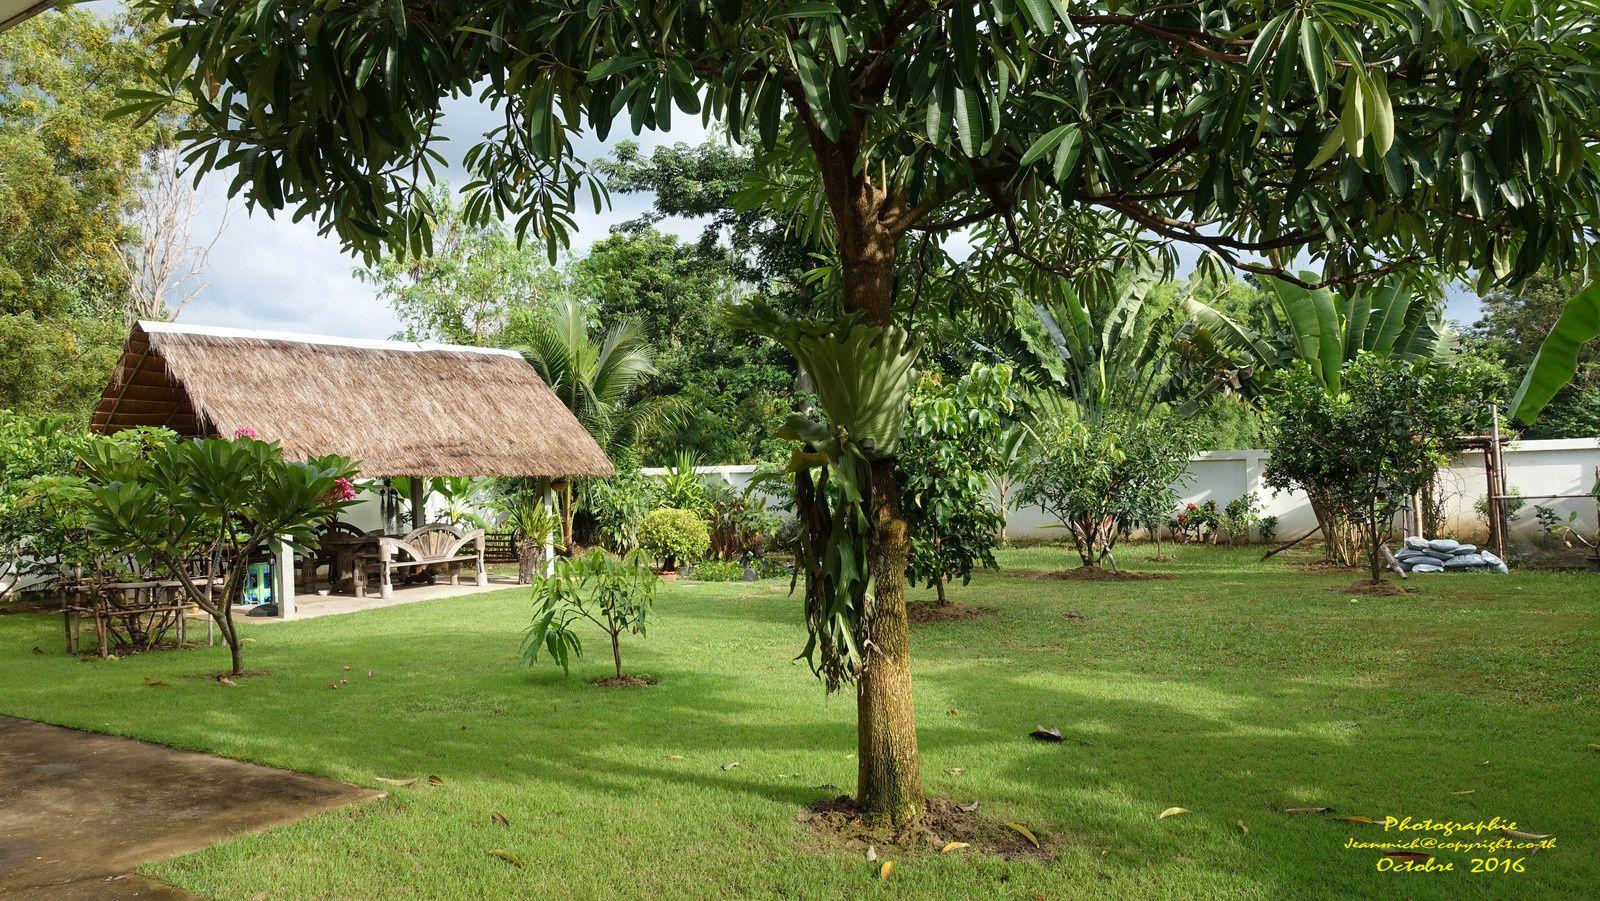 Autour de la maison en octobre (Ubonrat, Khon Kaen, Isaan)